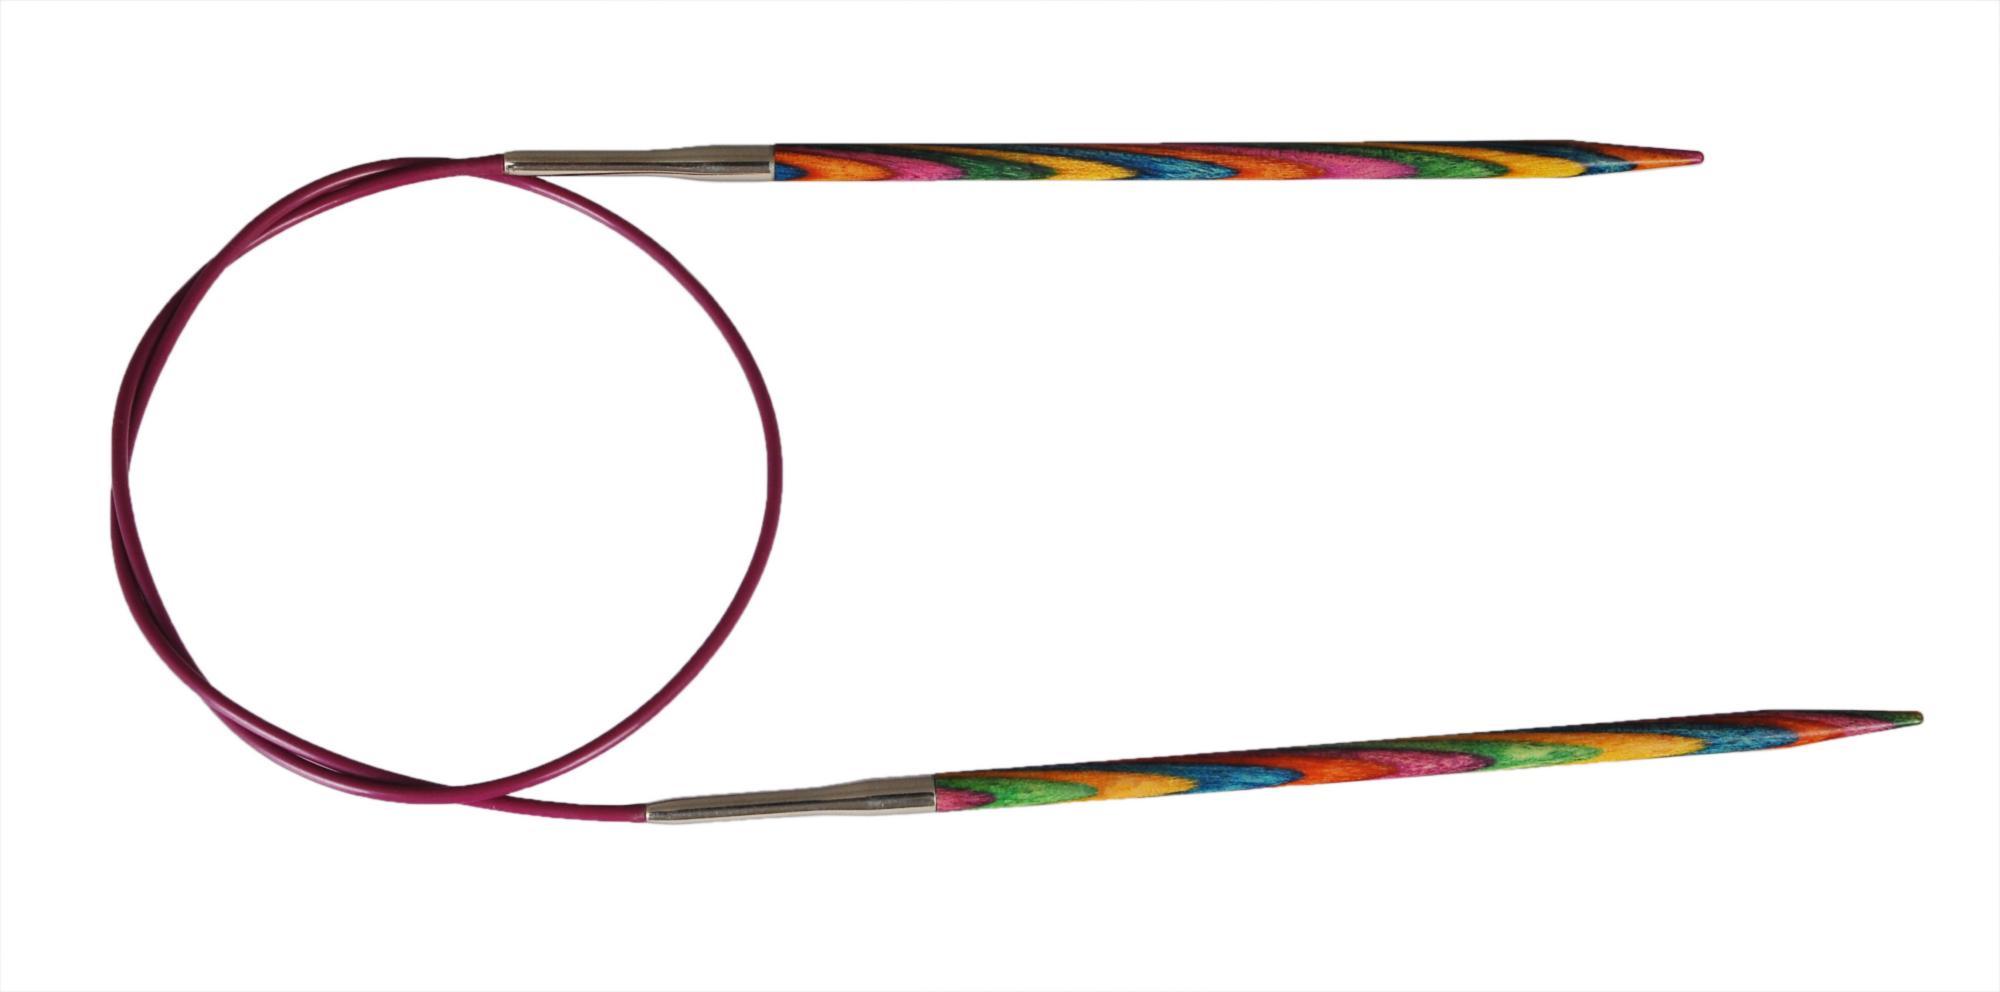 Спицы круговые 60 см Symfonie Wood KnitPro, 21332, 12.00 мм